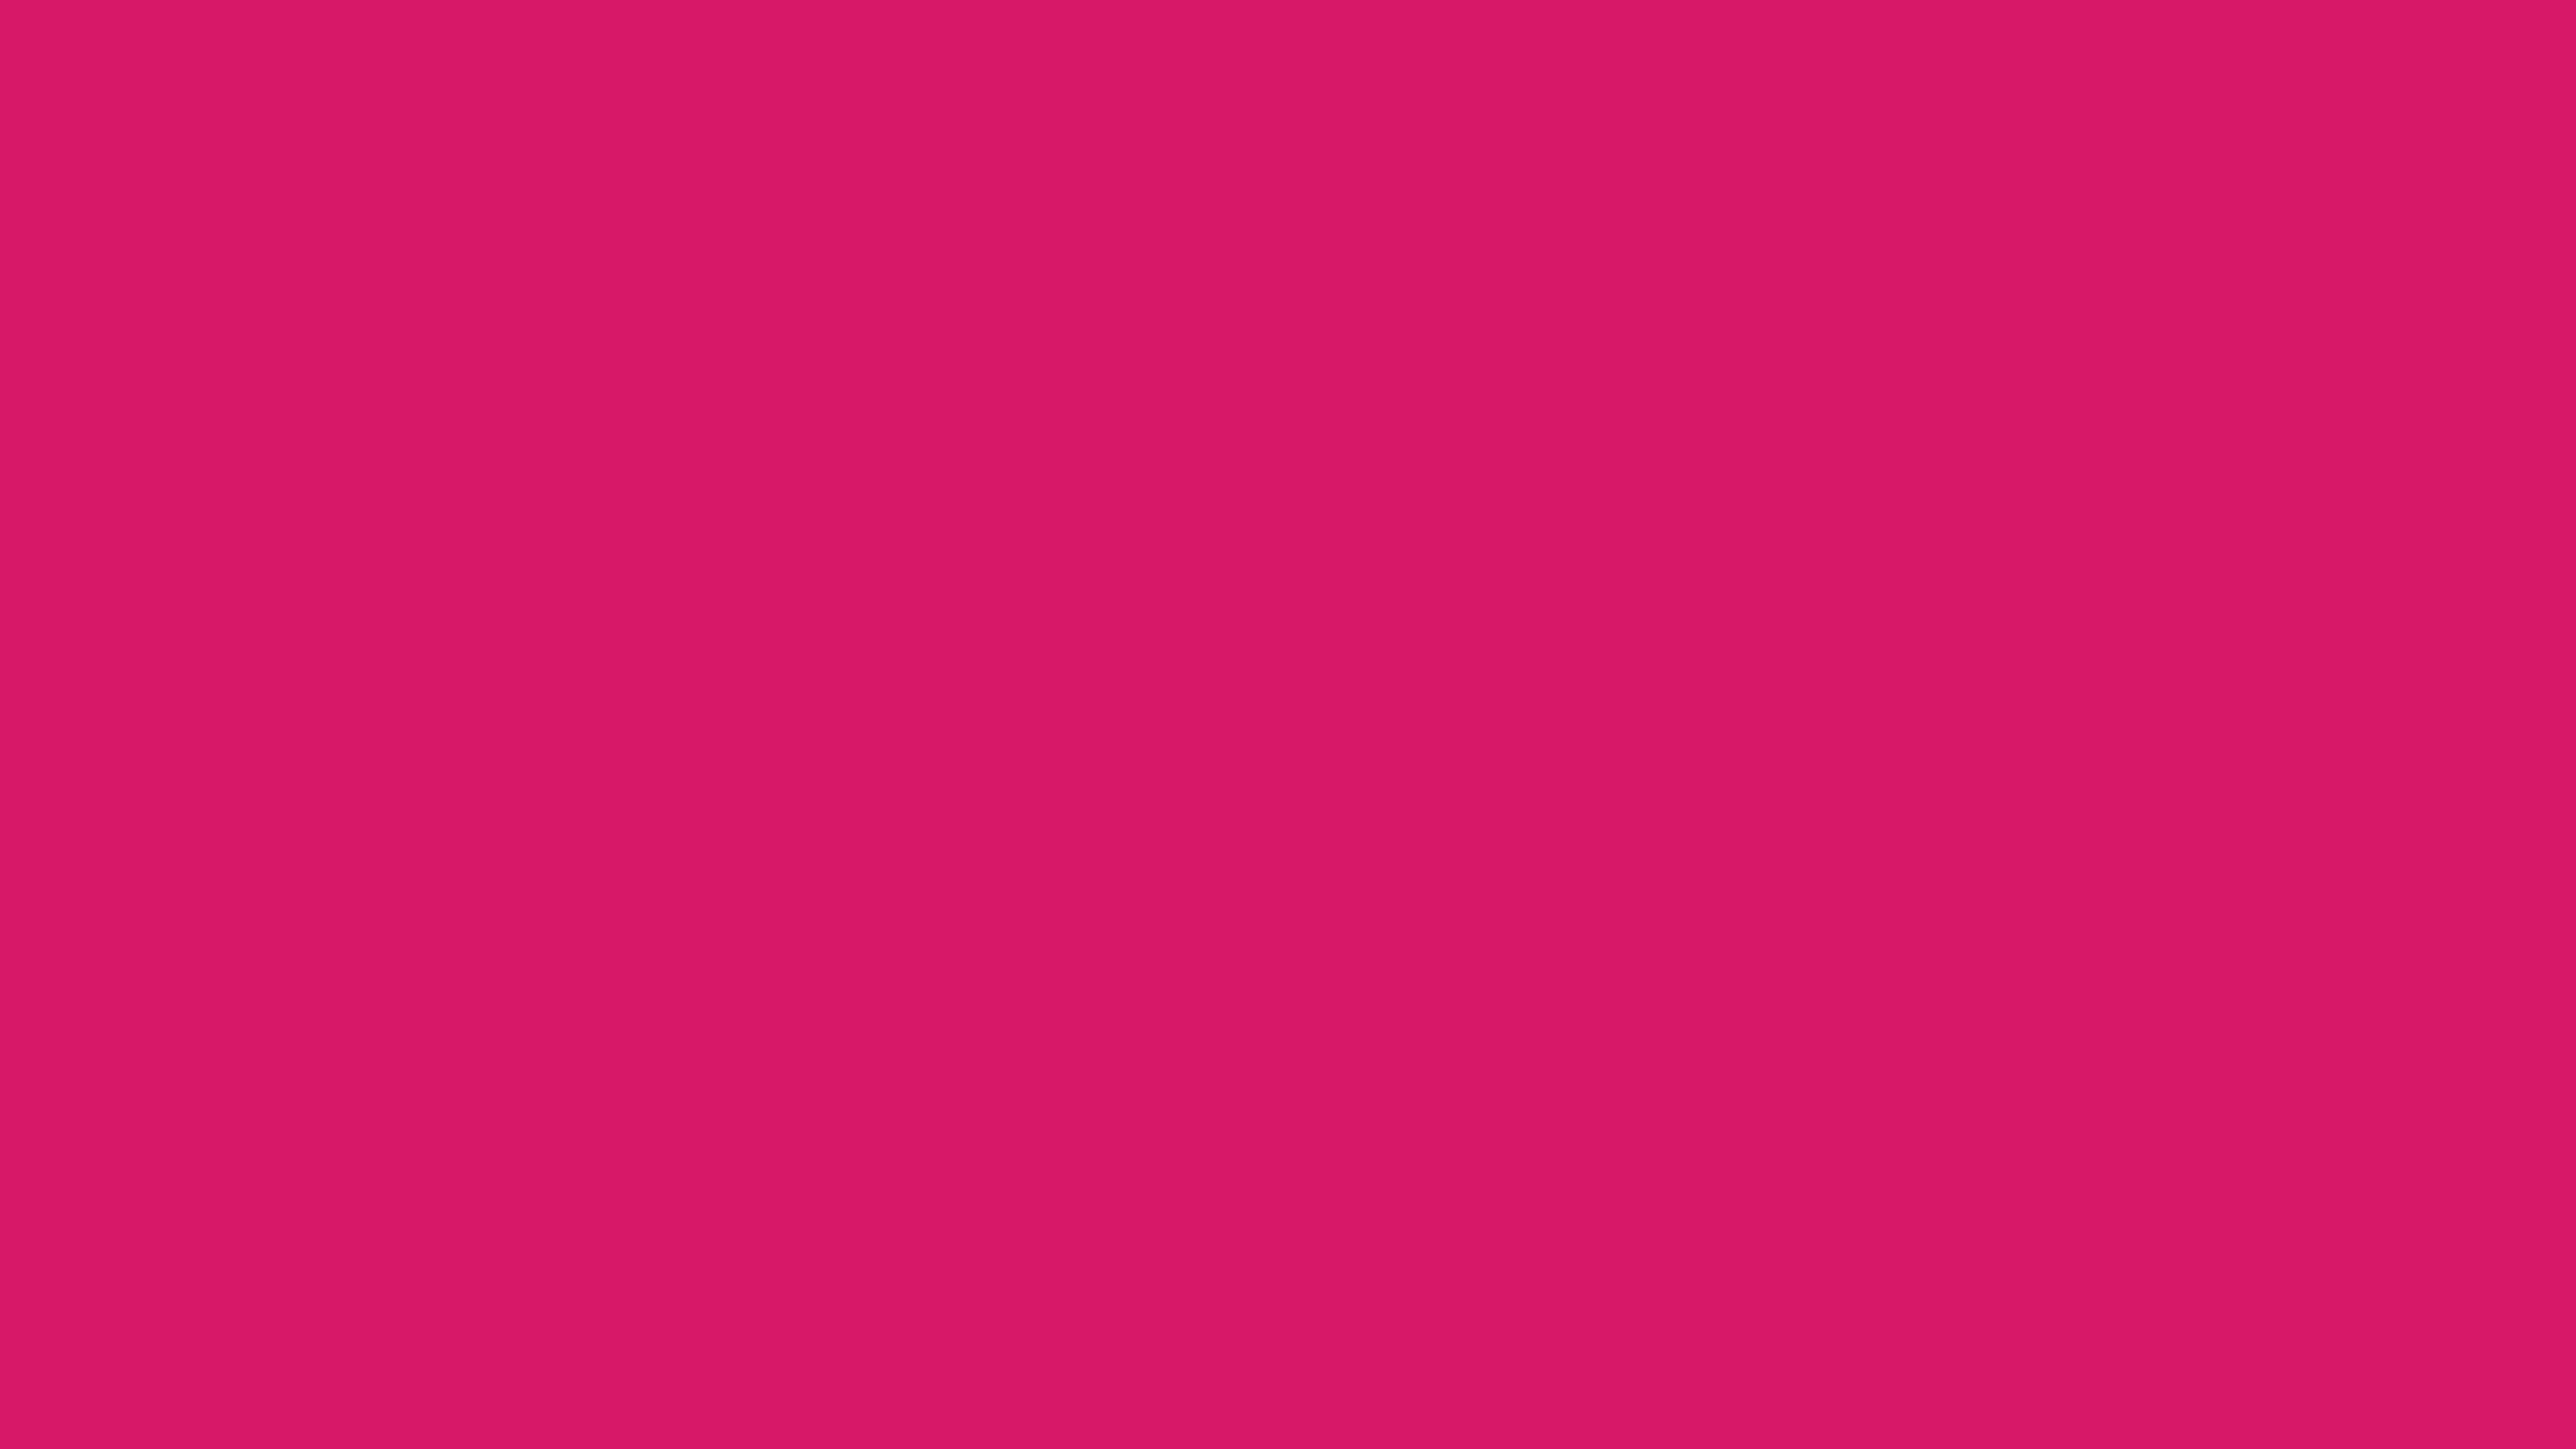 3840x2160 Dogwood Rose Solid Color Background